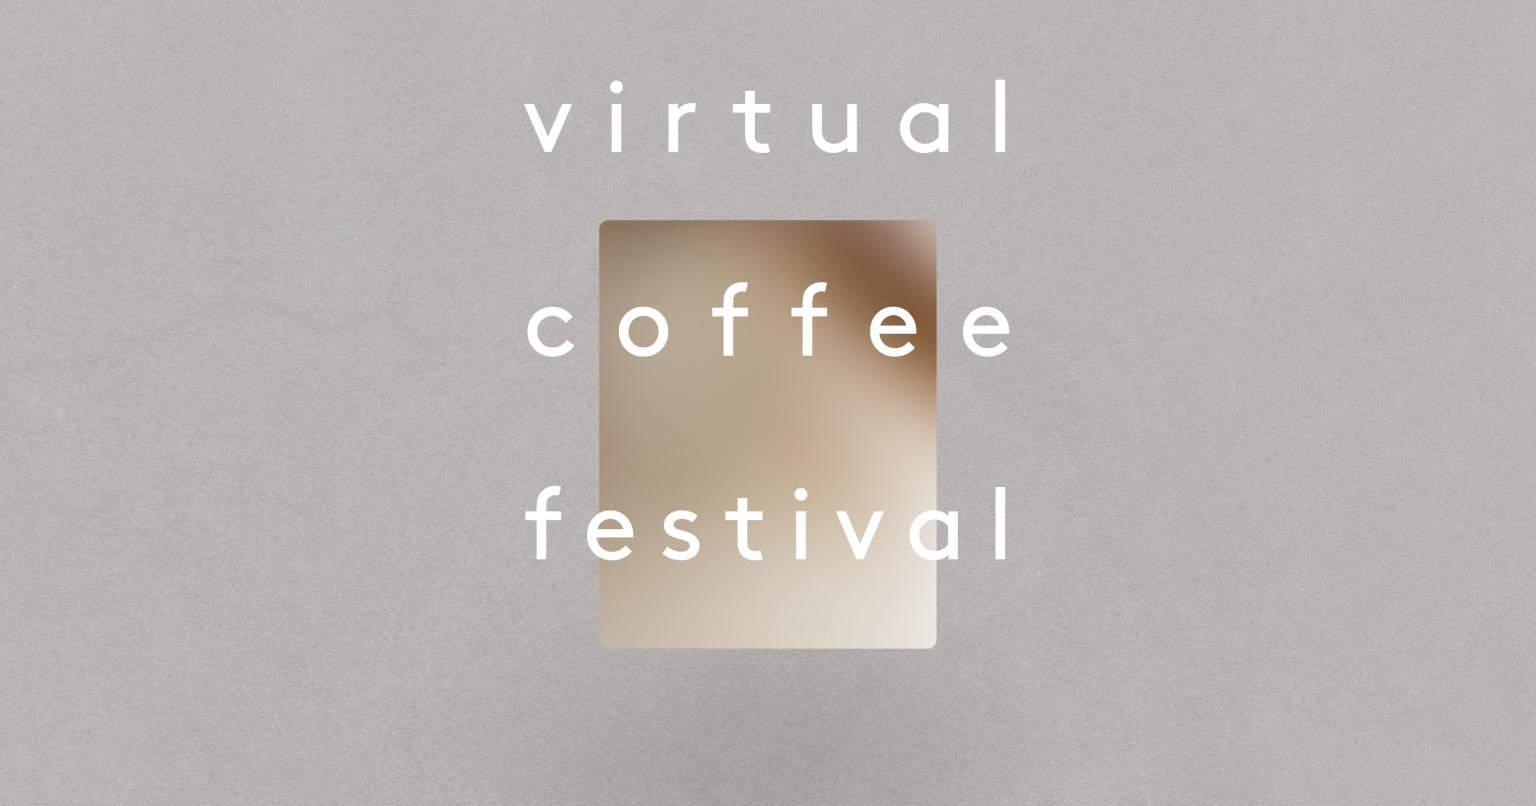 Virtual Coffee Festival - March 29, 2020